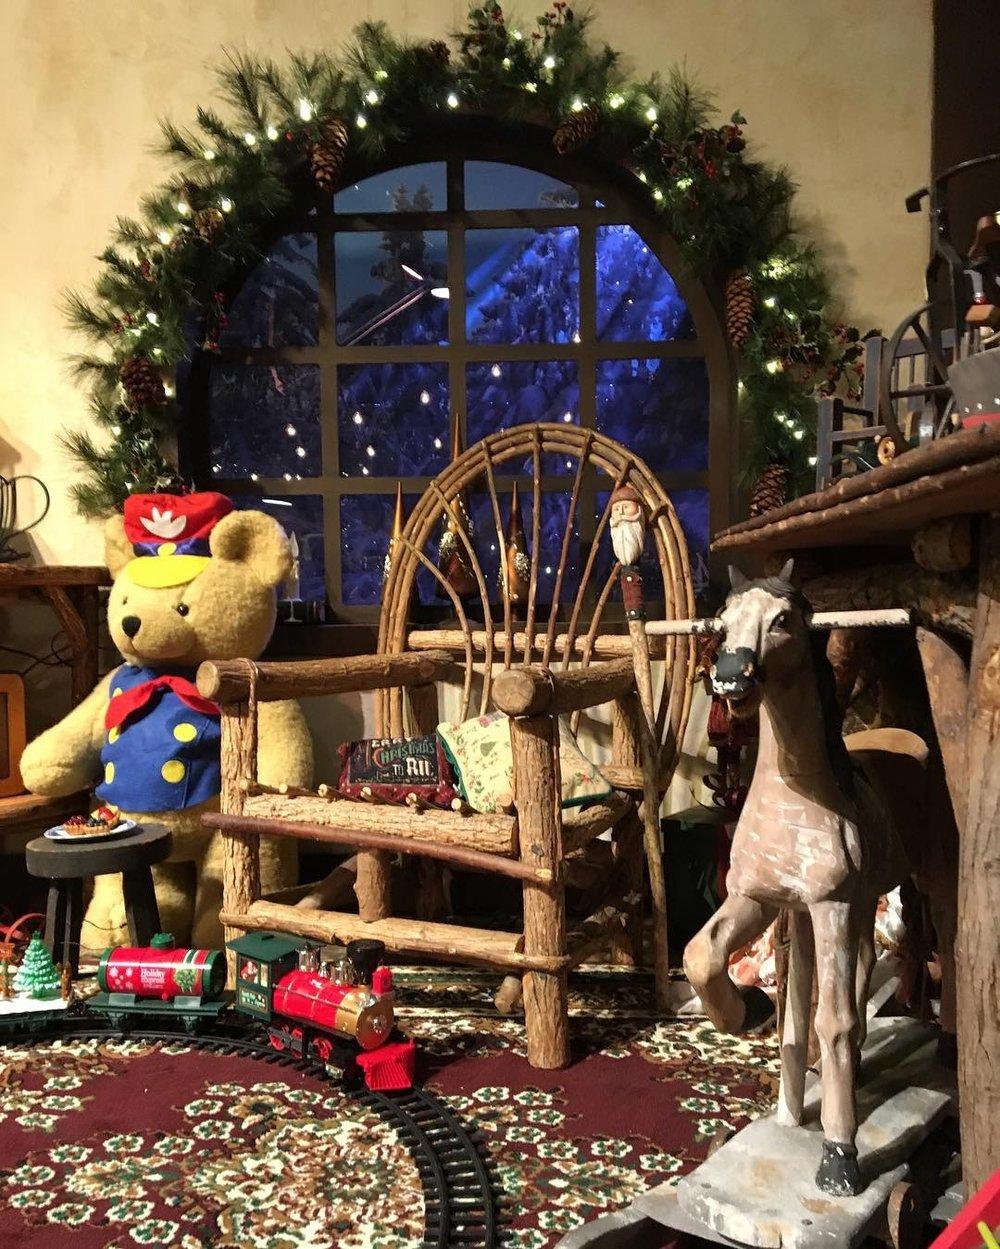 Knott's Merry Farm. #KnottsMerryFarm #KnottsBerryFarm #Knotts #Christmas #OrangeCounty #travel #themepark